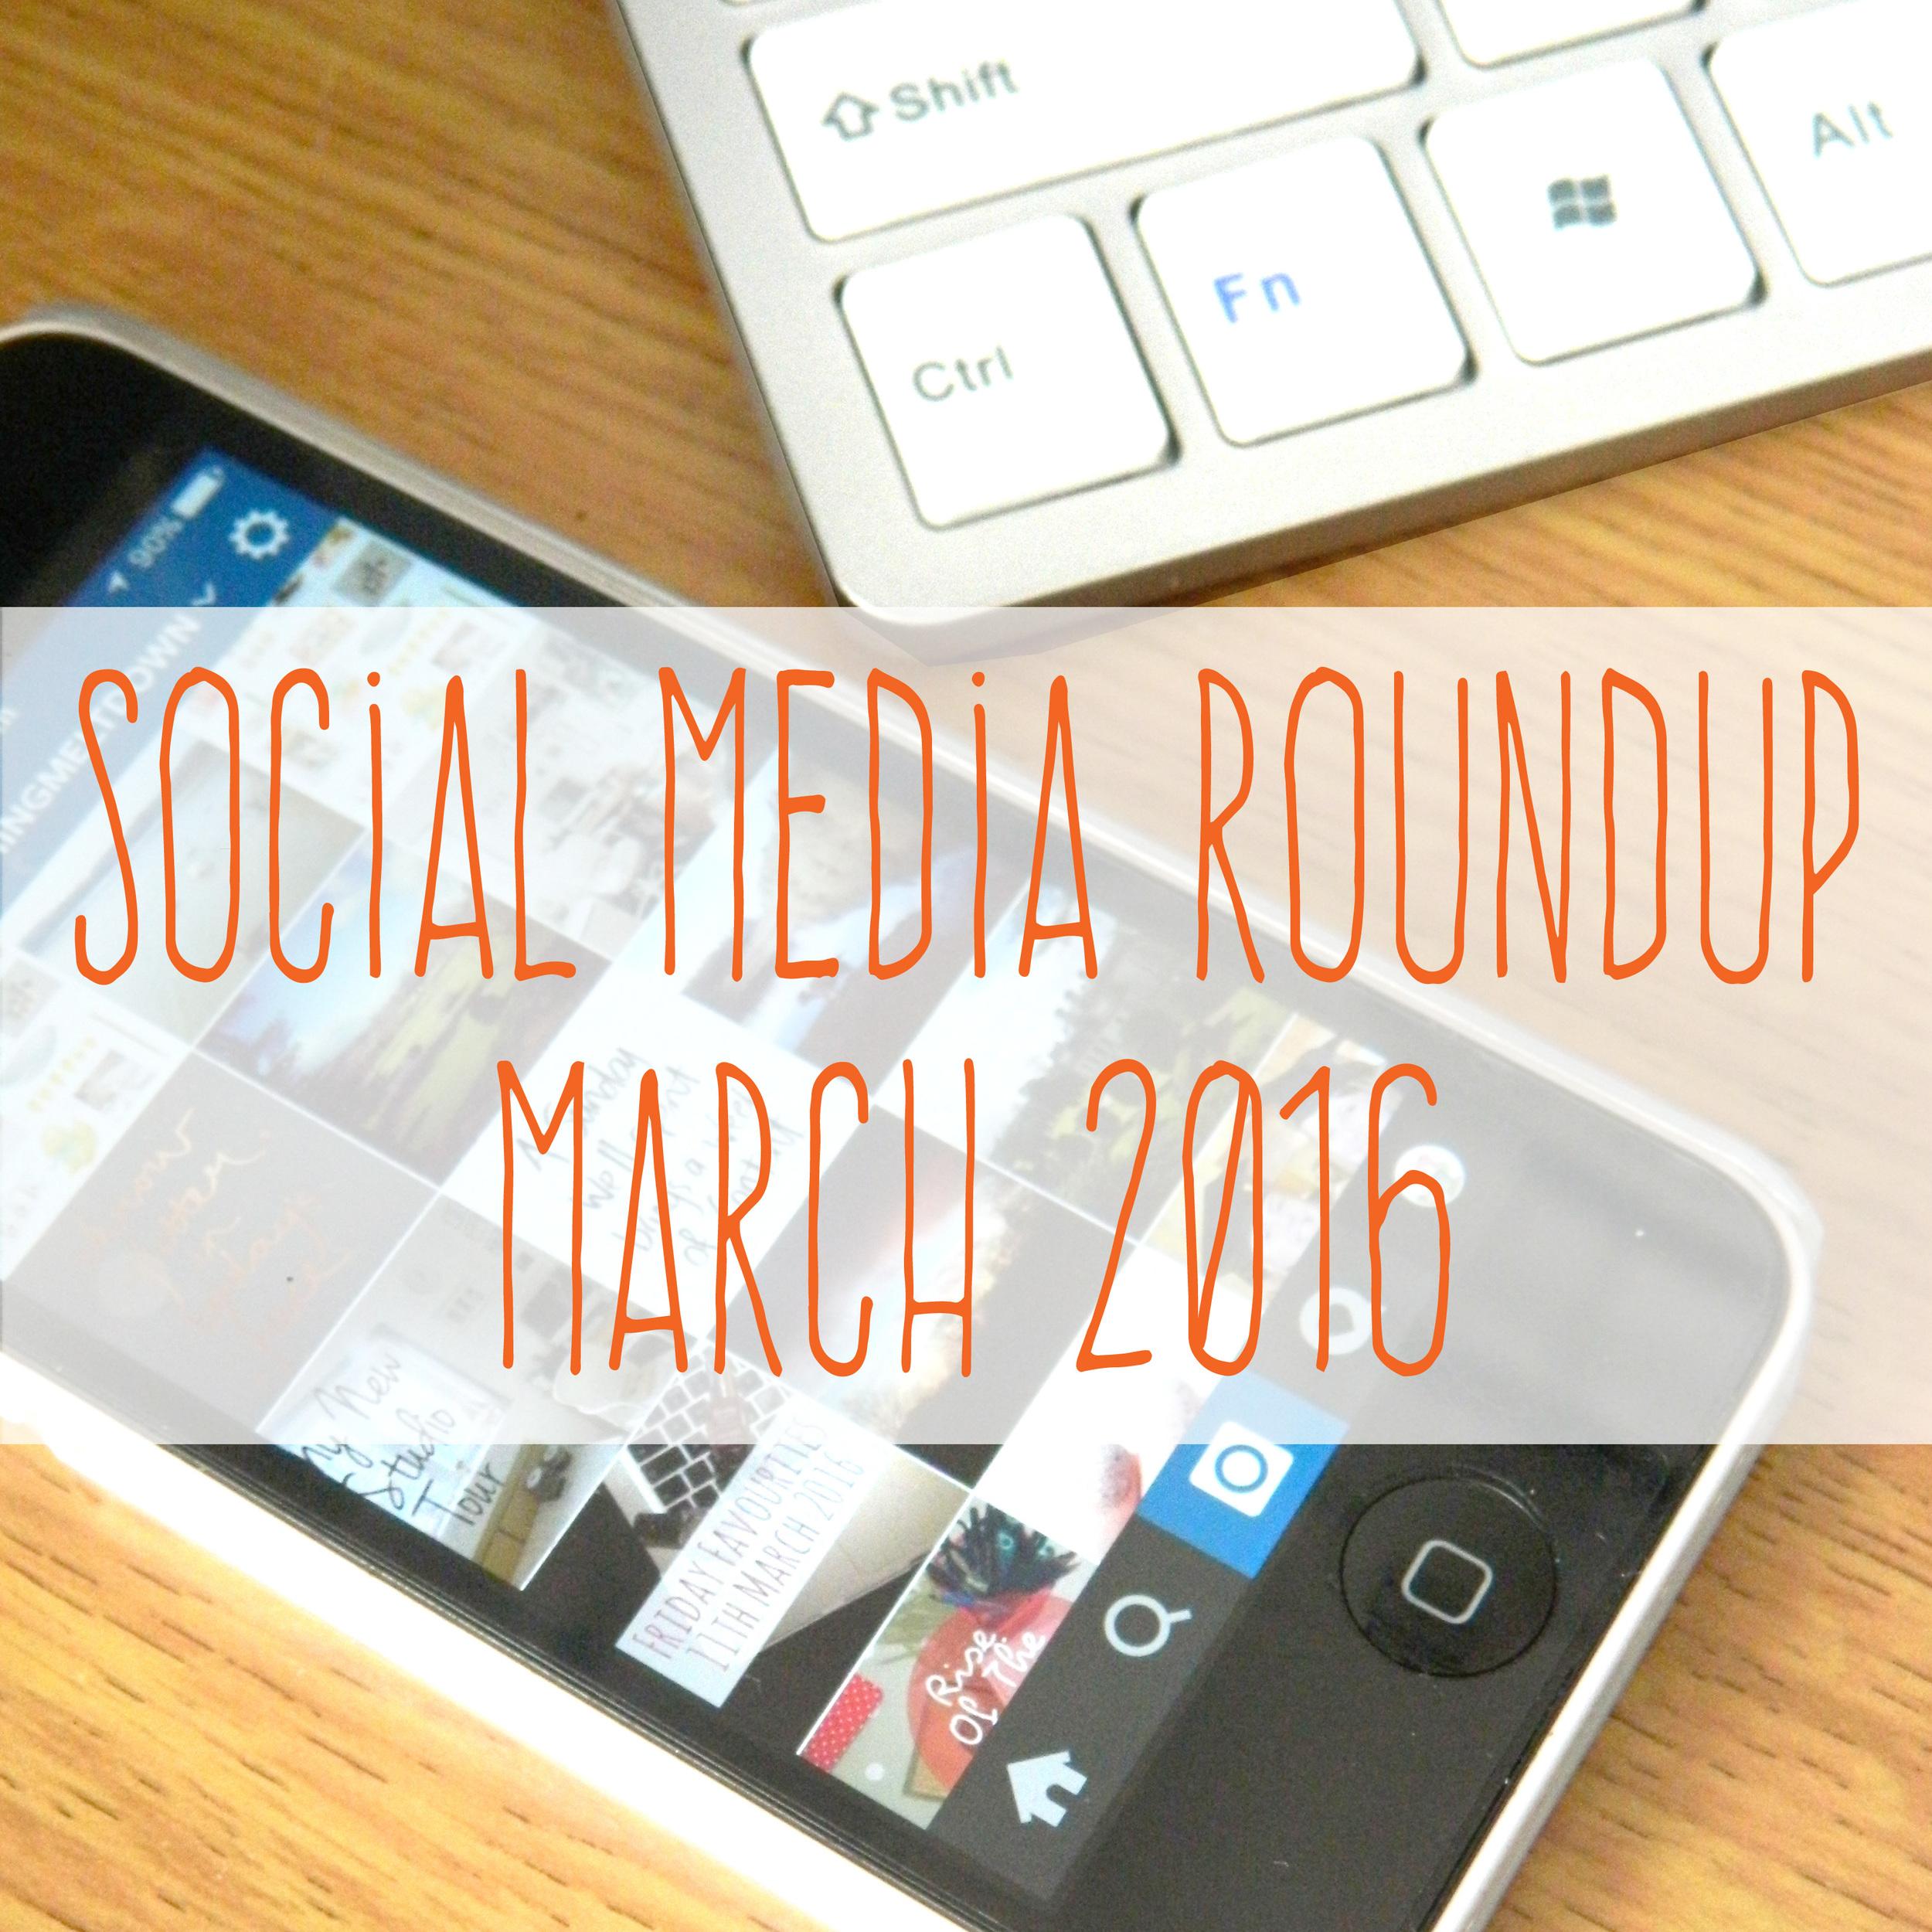 Social Media Roundup Promo March 2016